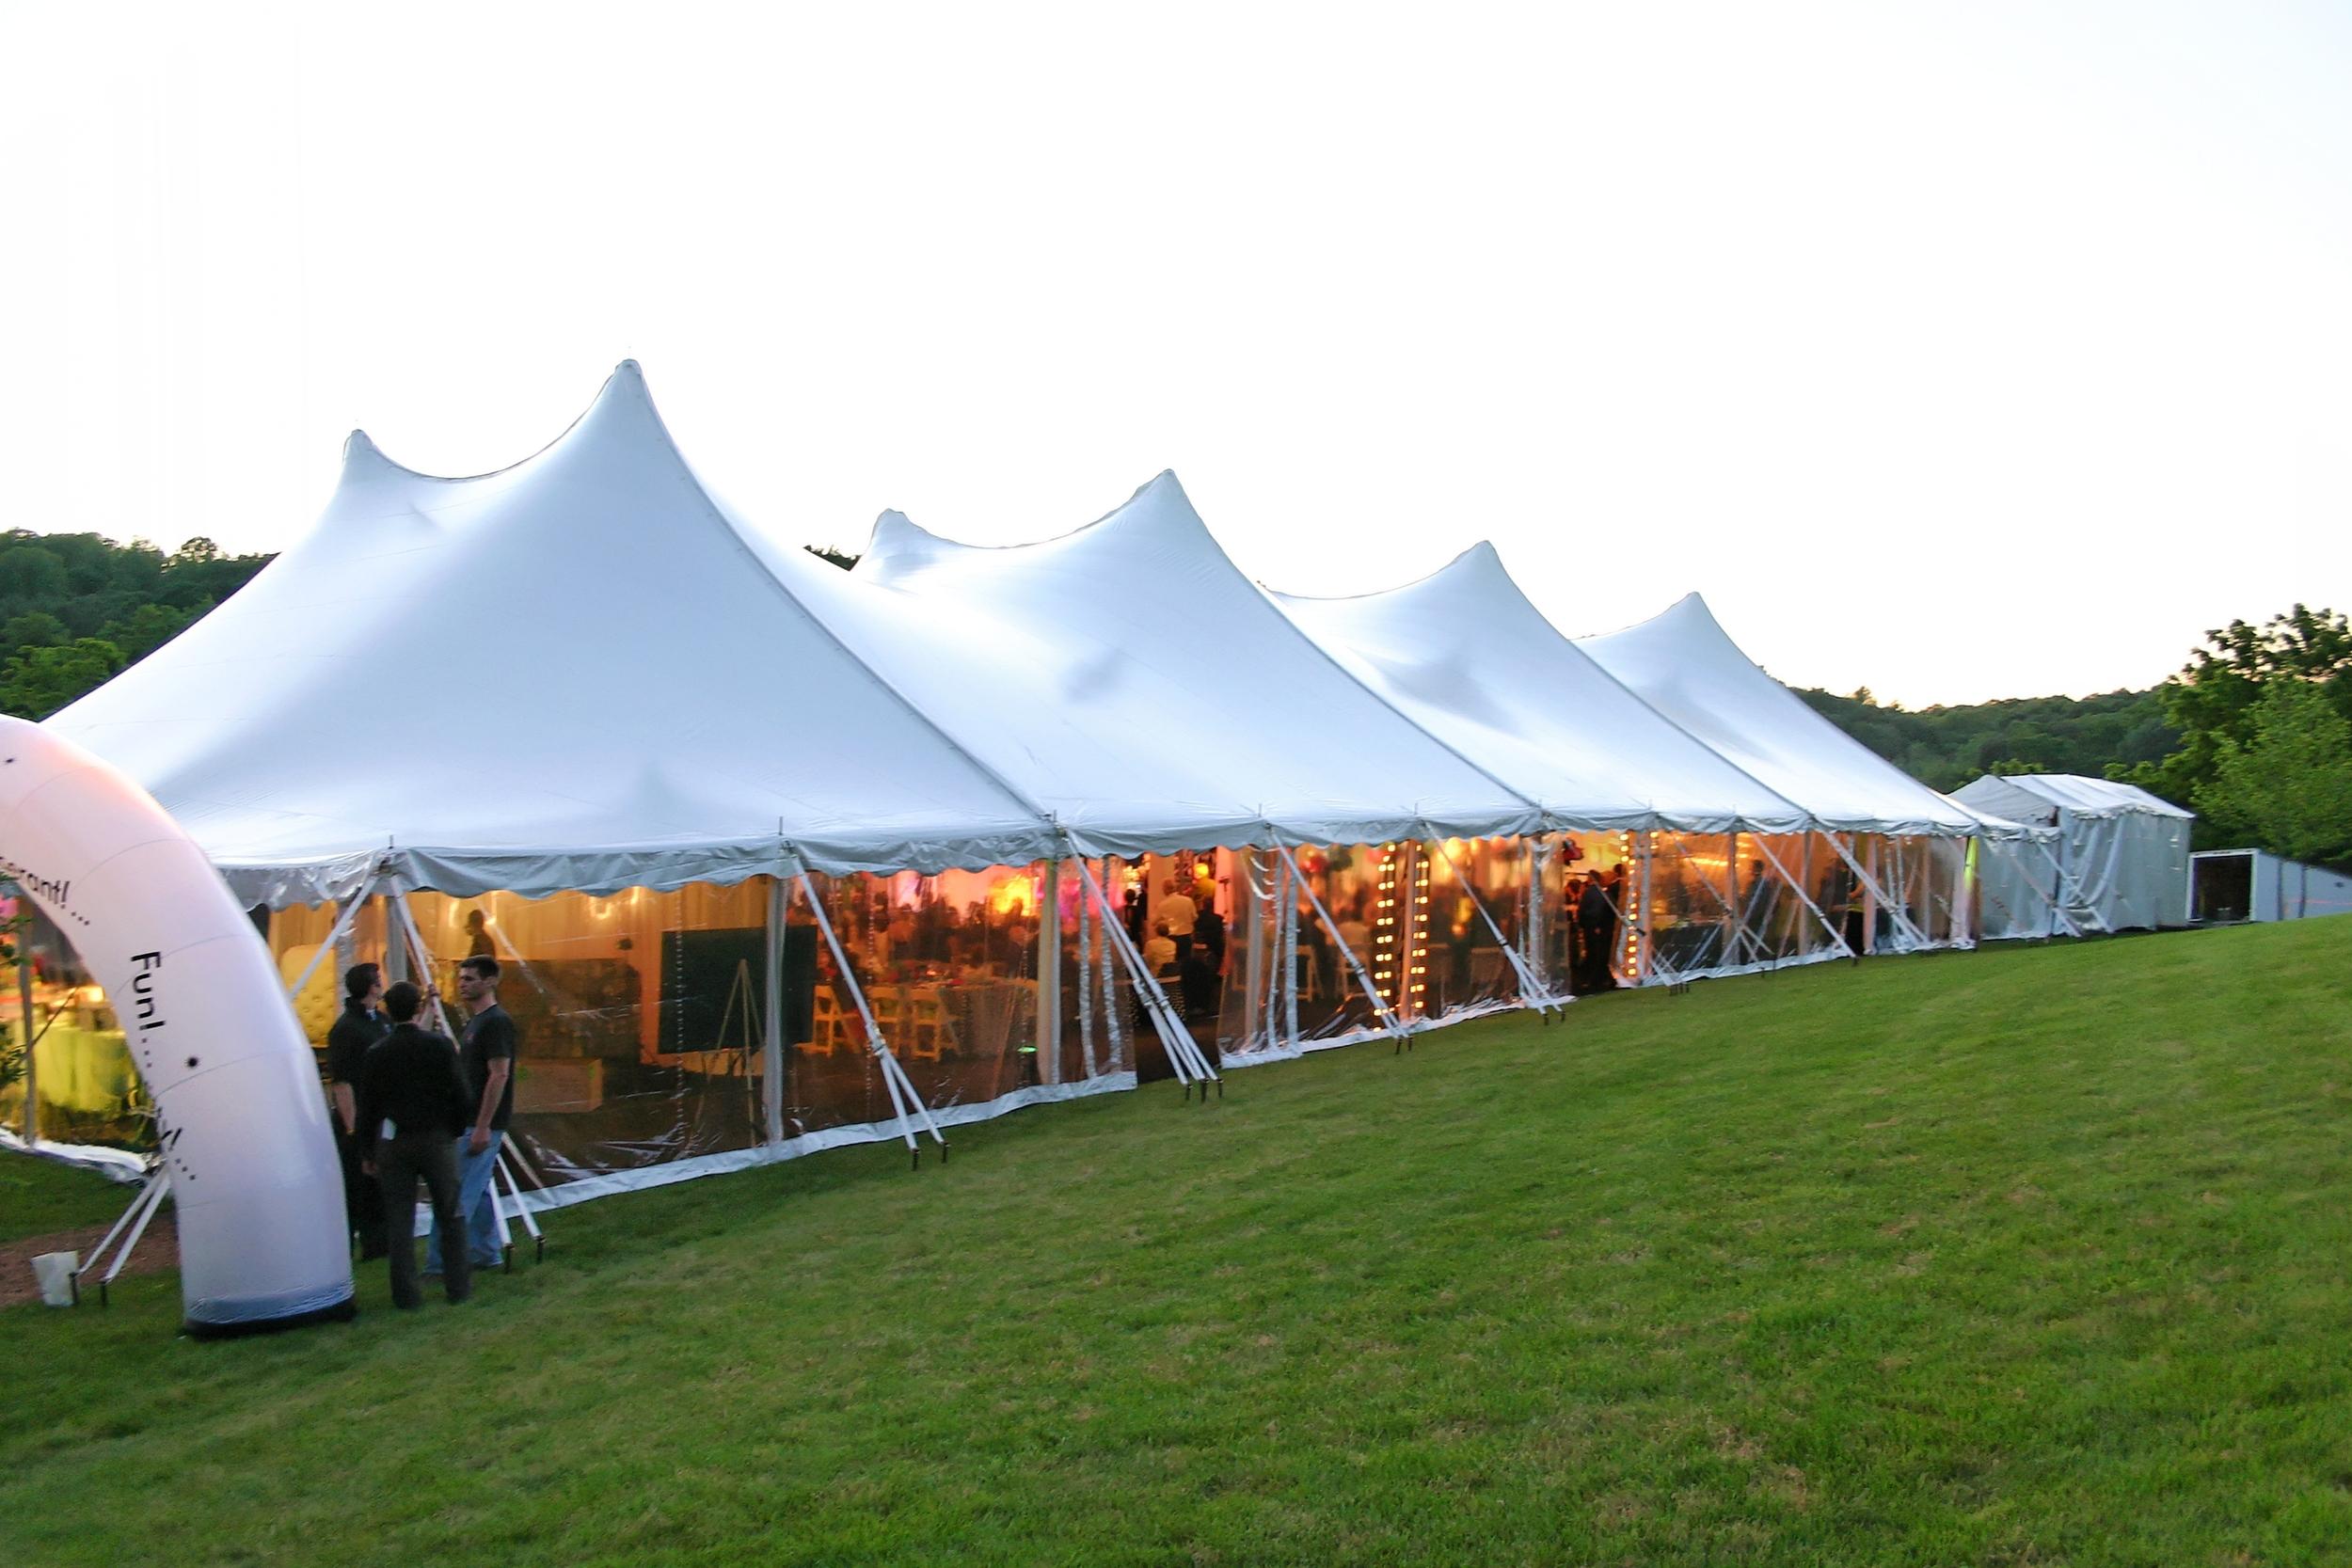 Allentown, PA rental tents